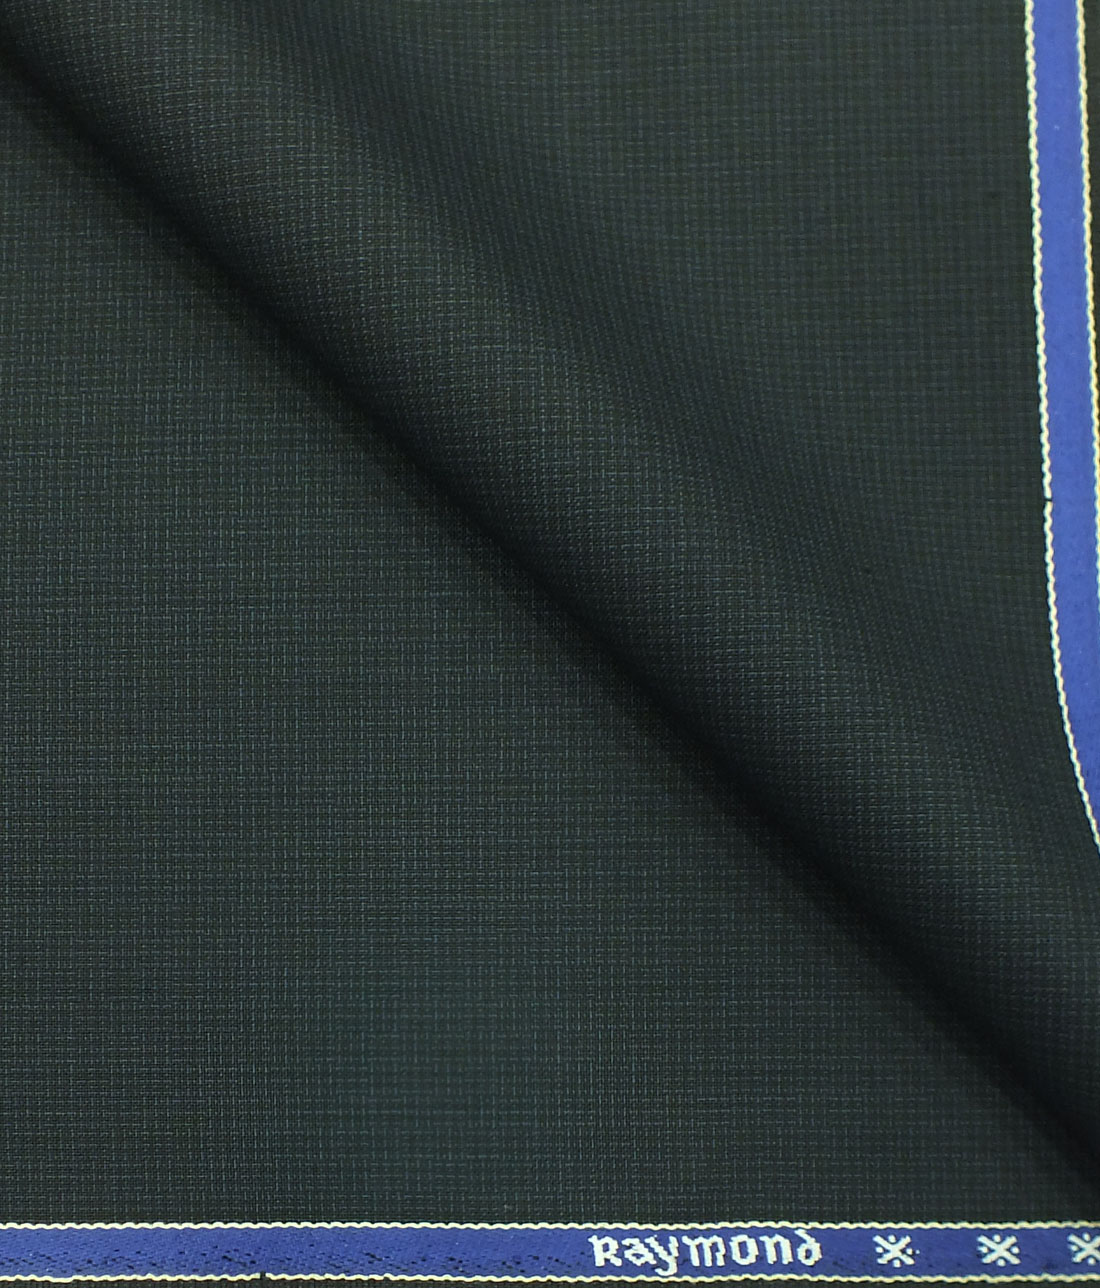 de3518459 Raymond Dark Sea Green Self Design Poly Viscose Trouser or 3 Piece Suit  Fabric (Unstitched - 1.25 Mtr)